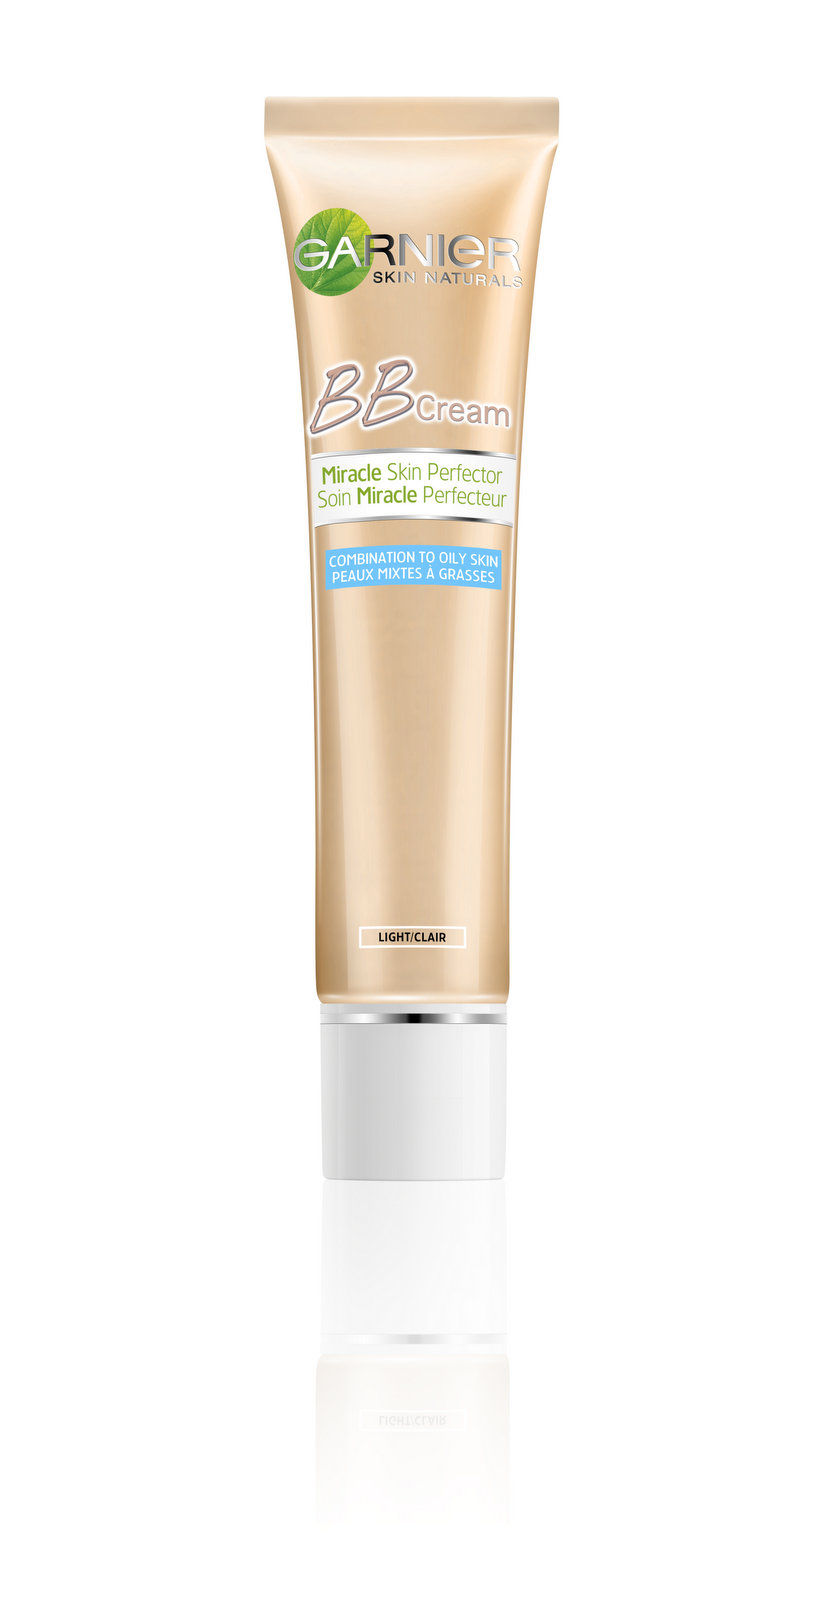 Garnier - BB Cream Oil Free Miracle Skin Perfector